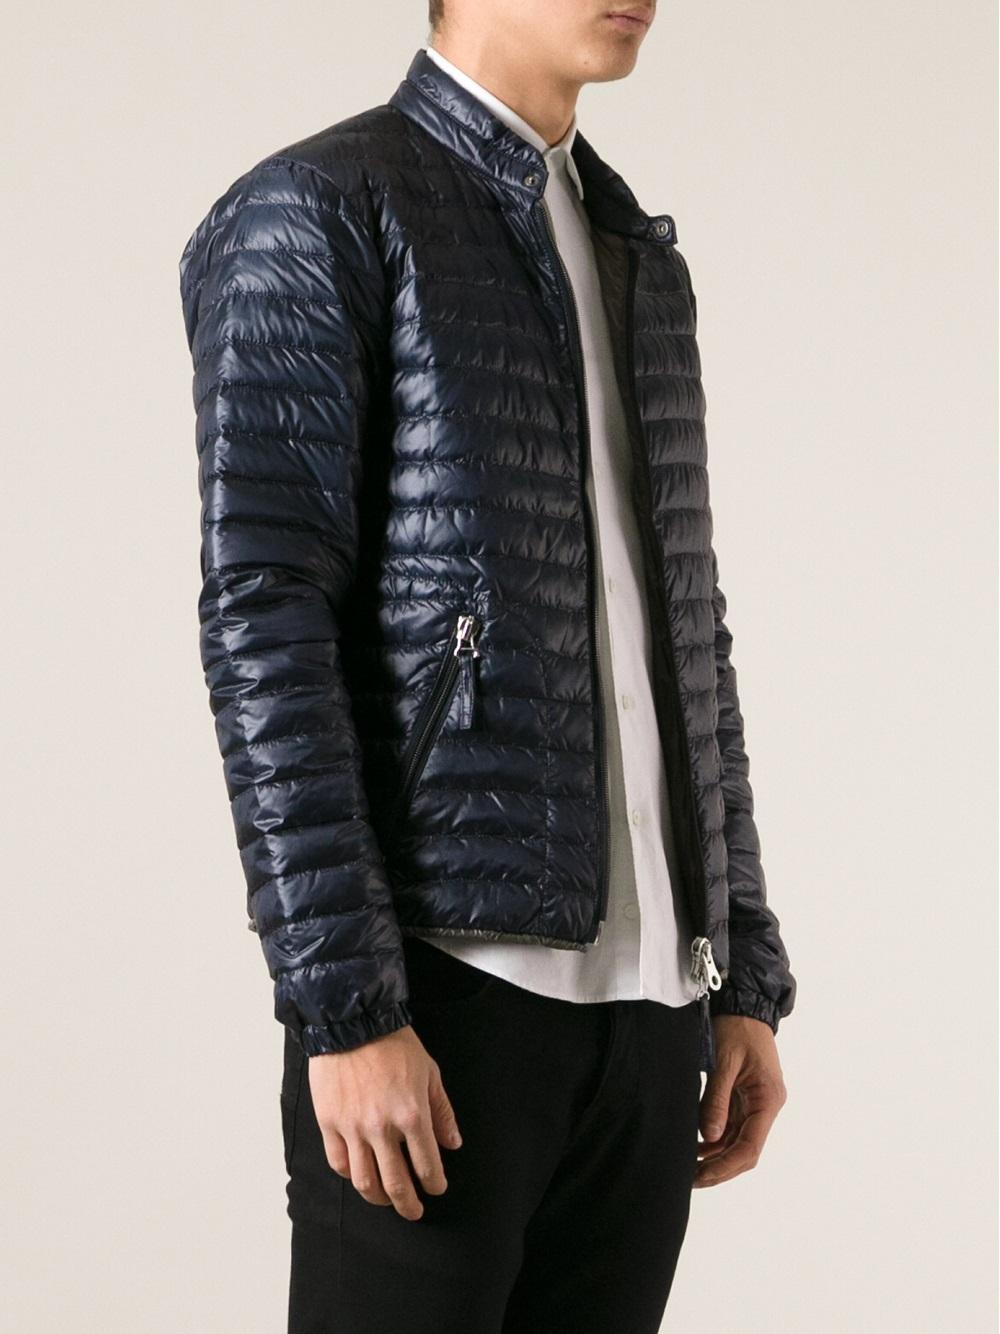 Duvetica Bacco Jacket